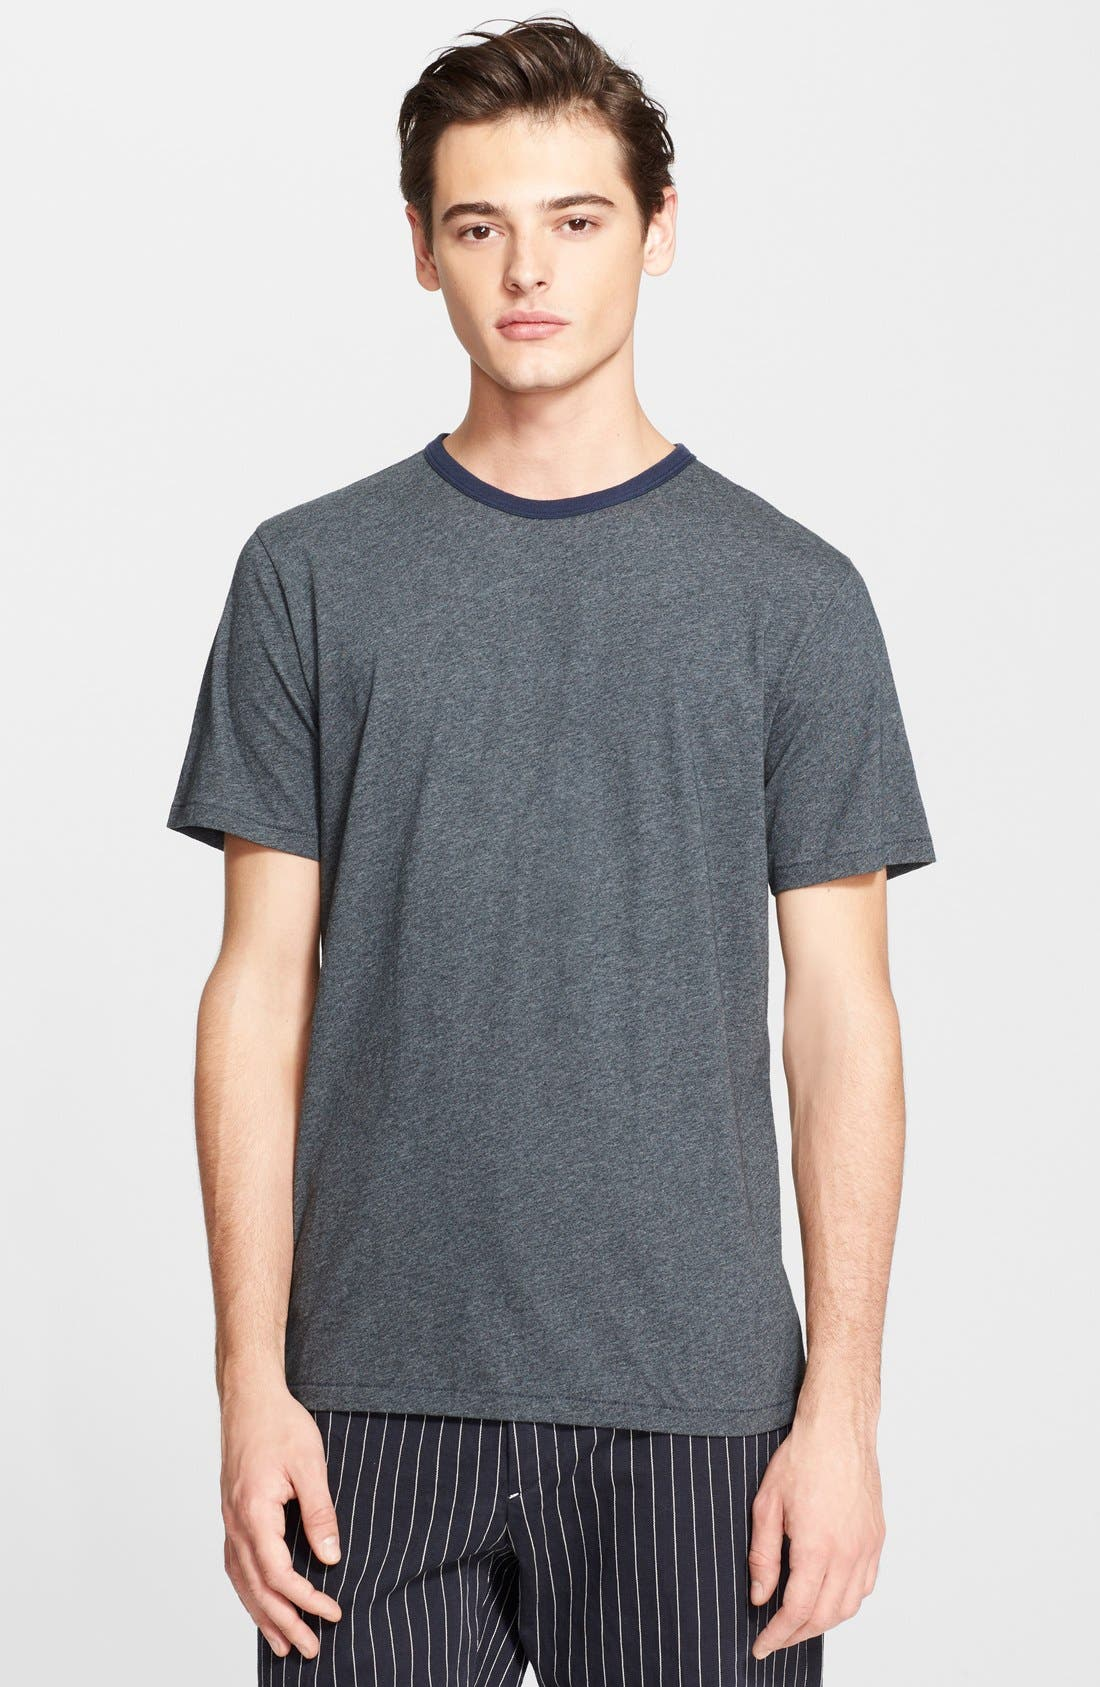 RAG & BONE Ringer T-Shirt, Main, color, 050